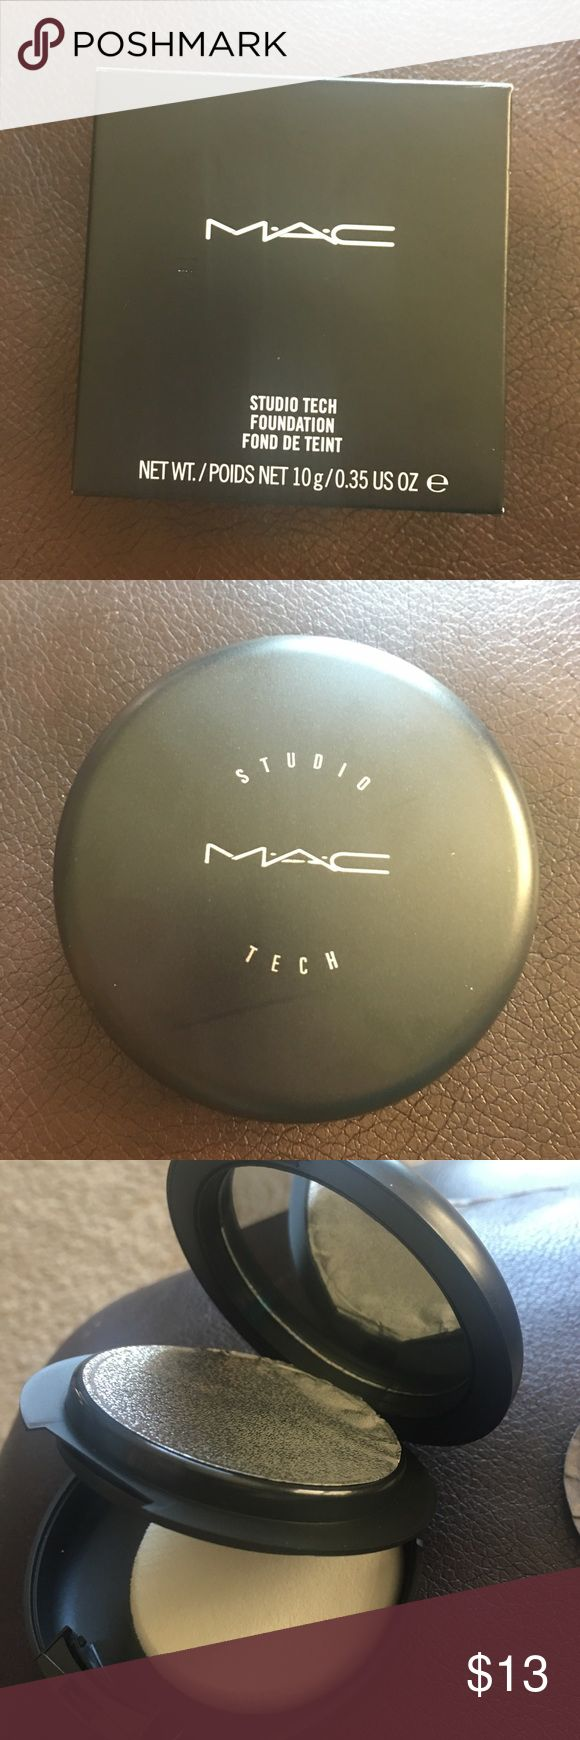 Mac foundation NC45 Studio Tech NC45 MAC foundation Brand new never opened MAC Cosmetics Makeup Foundation